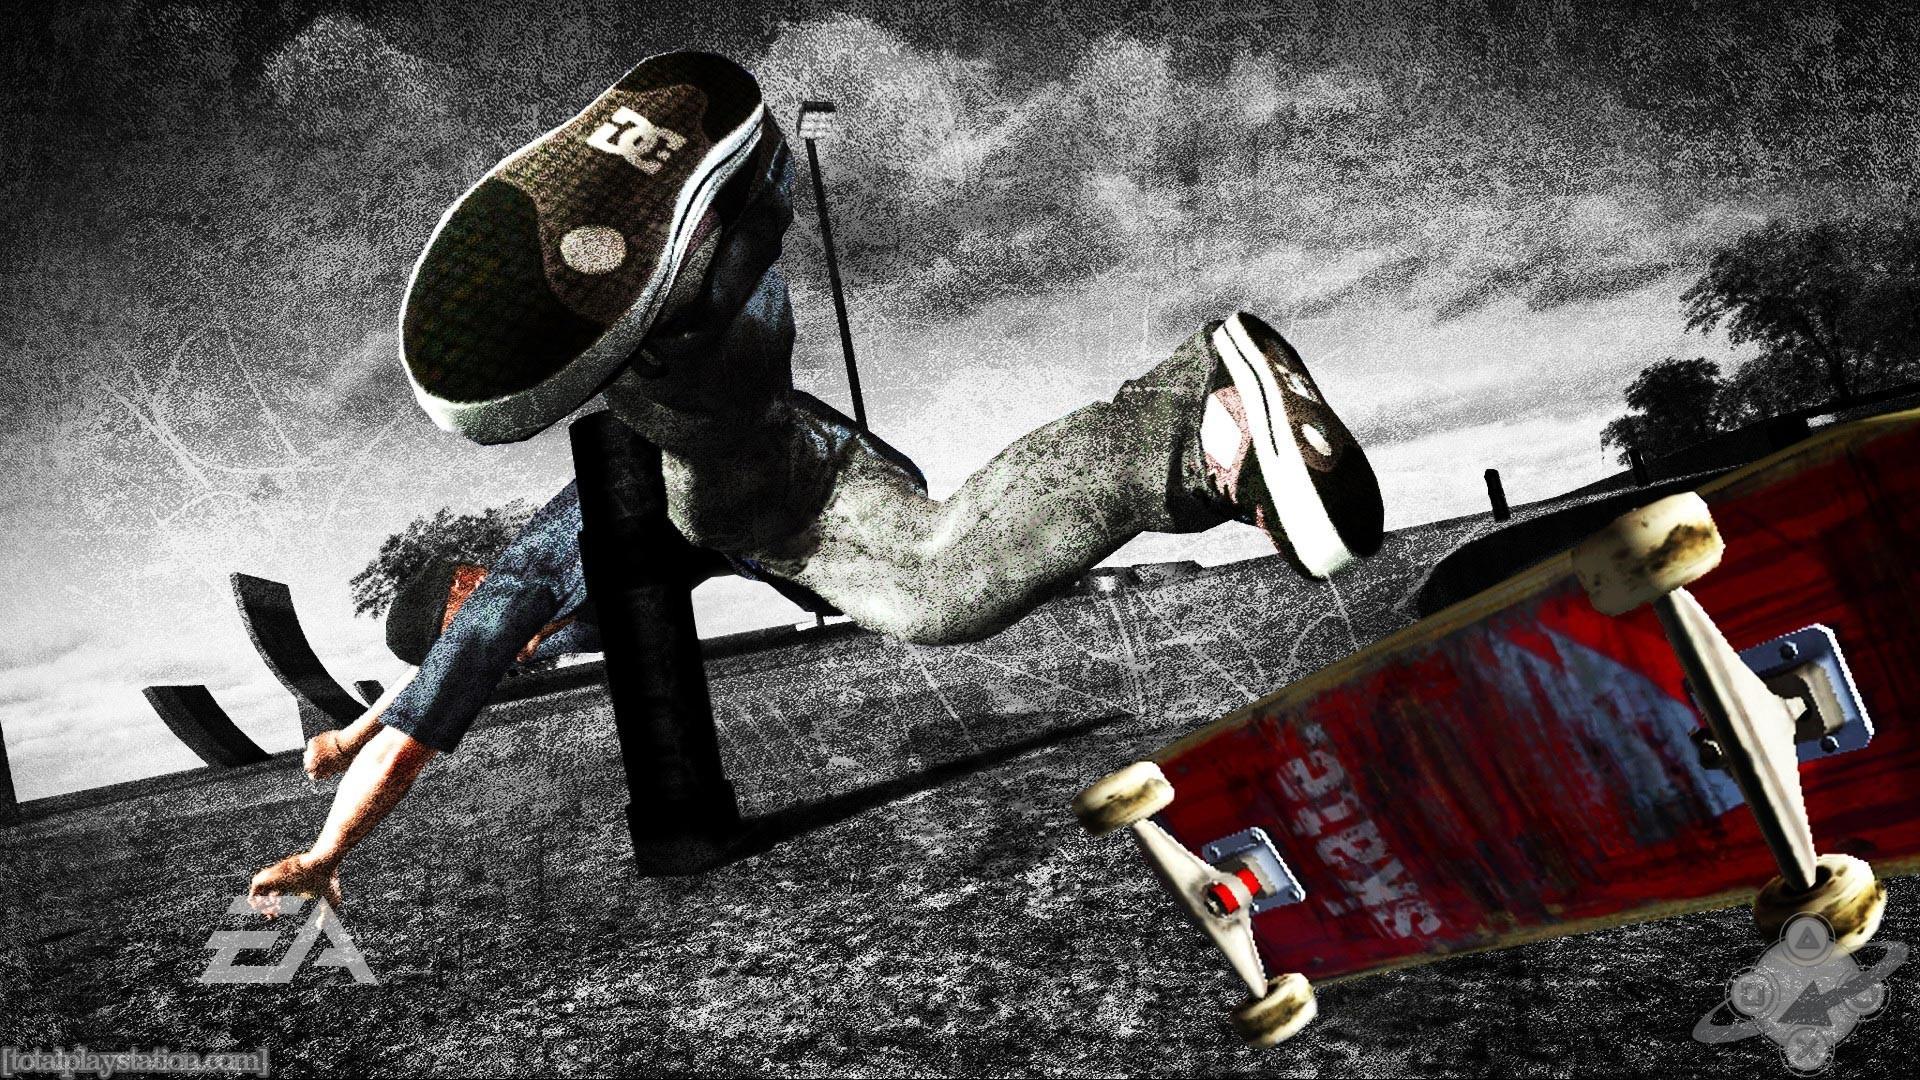 Red Sox Wallpaper Iphone X Skateboard Brand Wallpaper Hd 183 ①